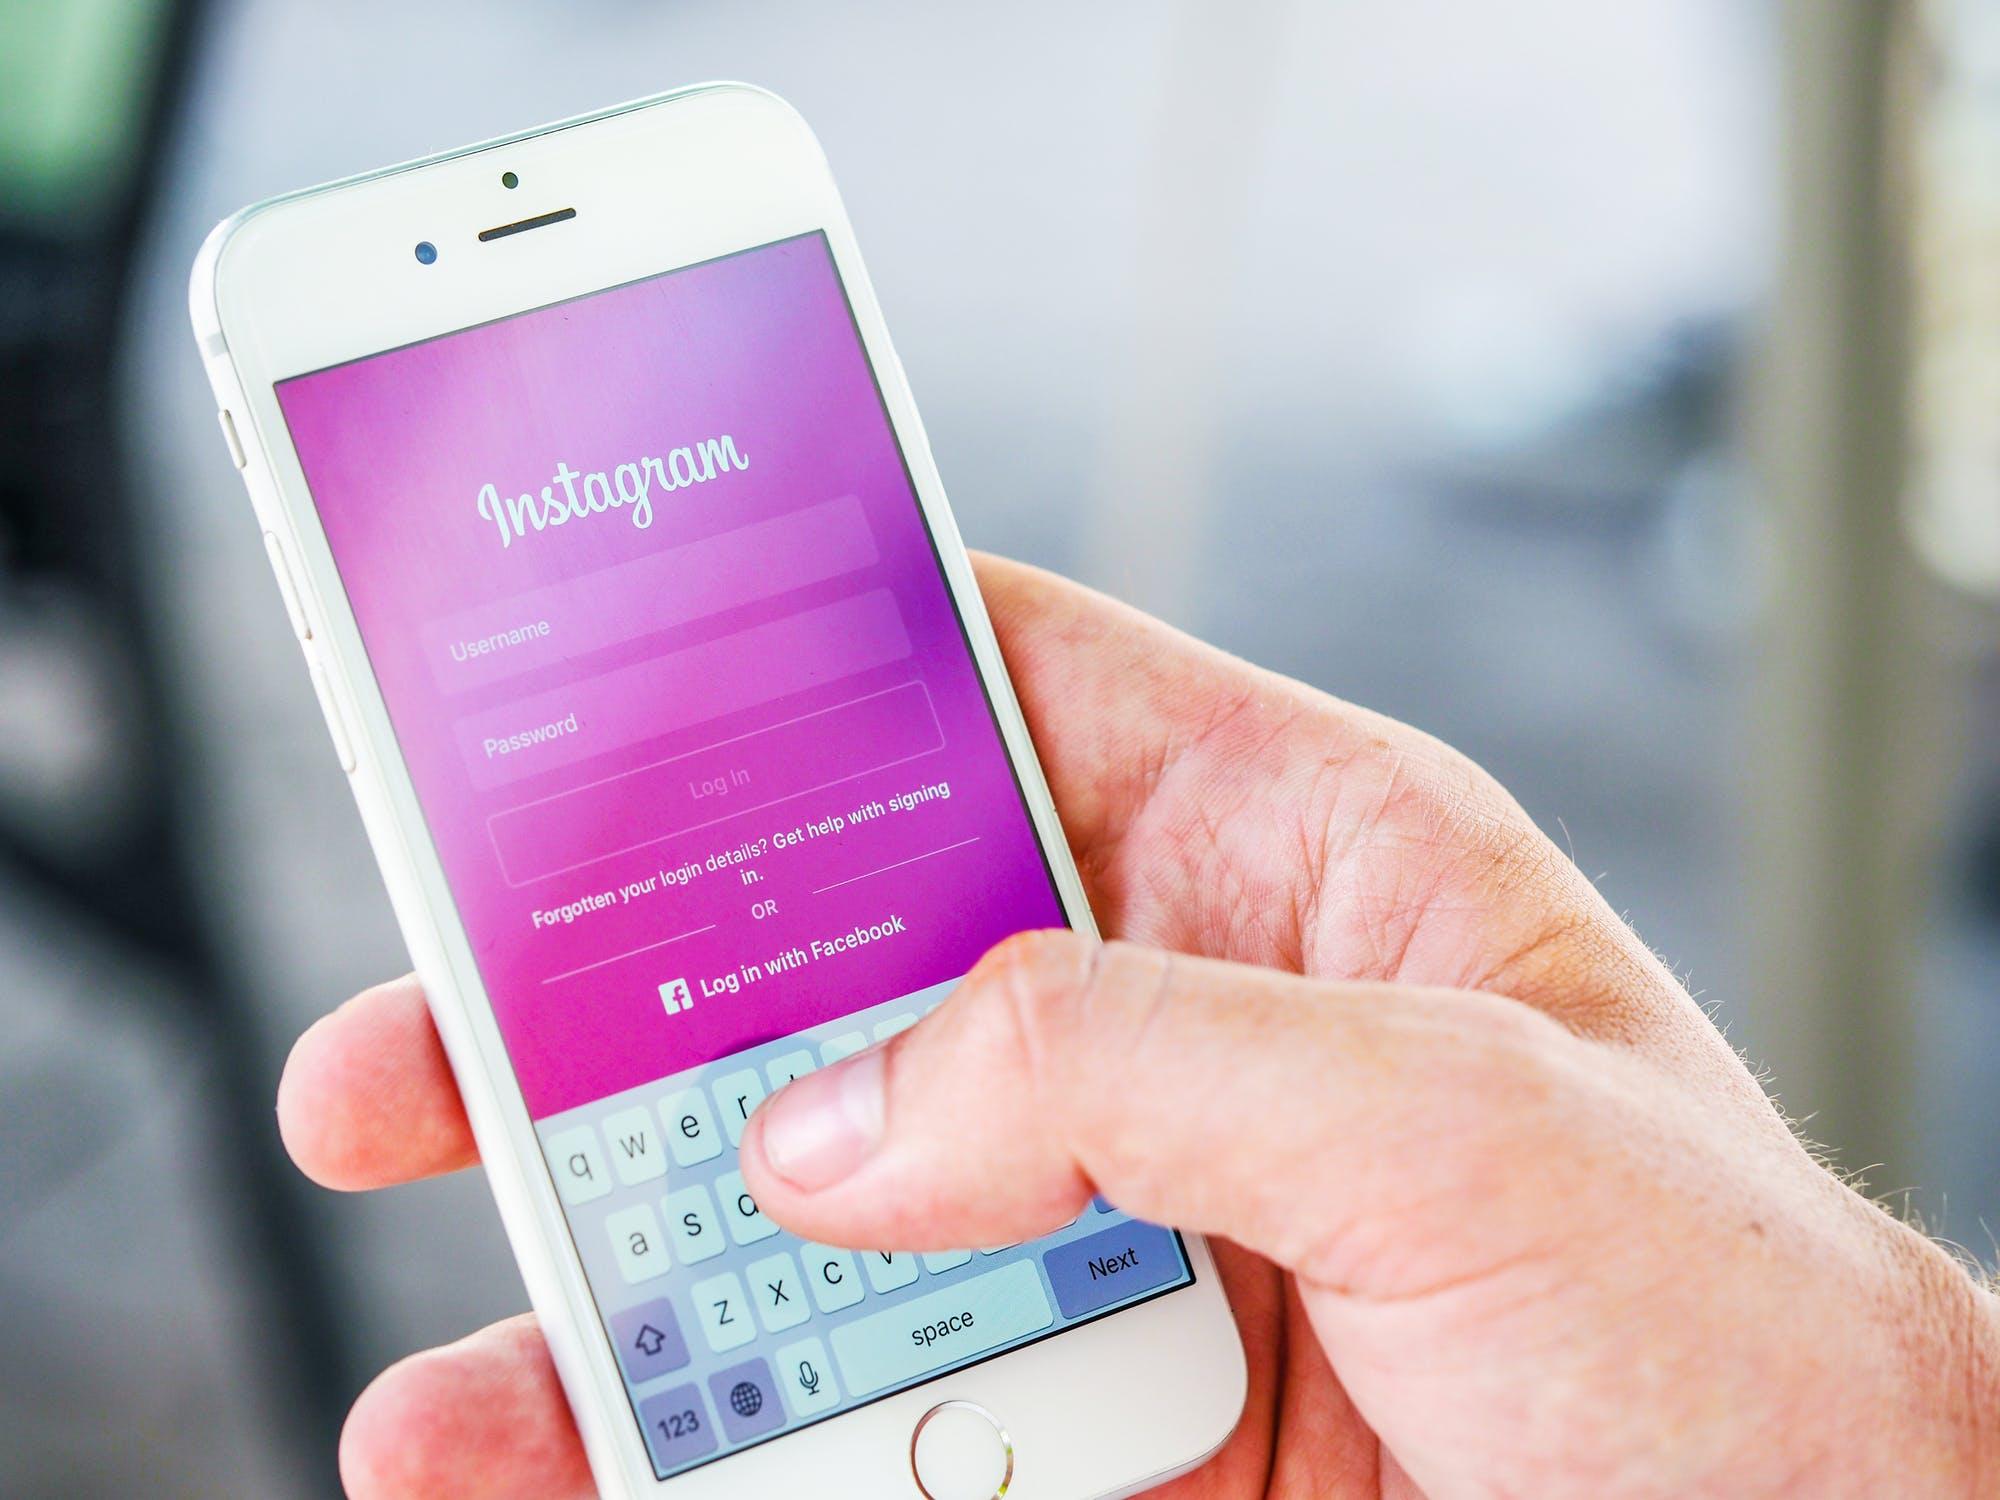 image of instagram mobile app